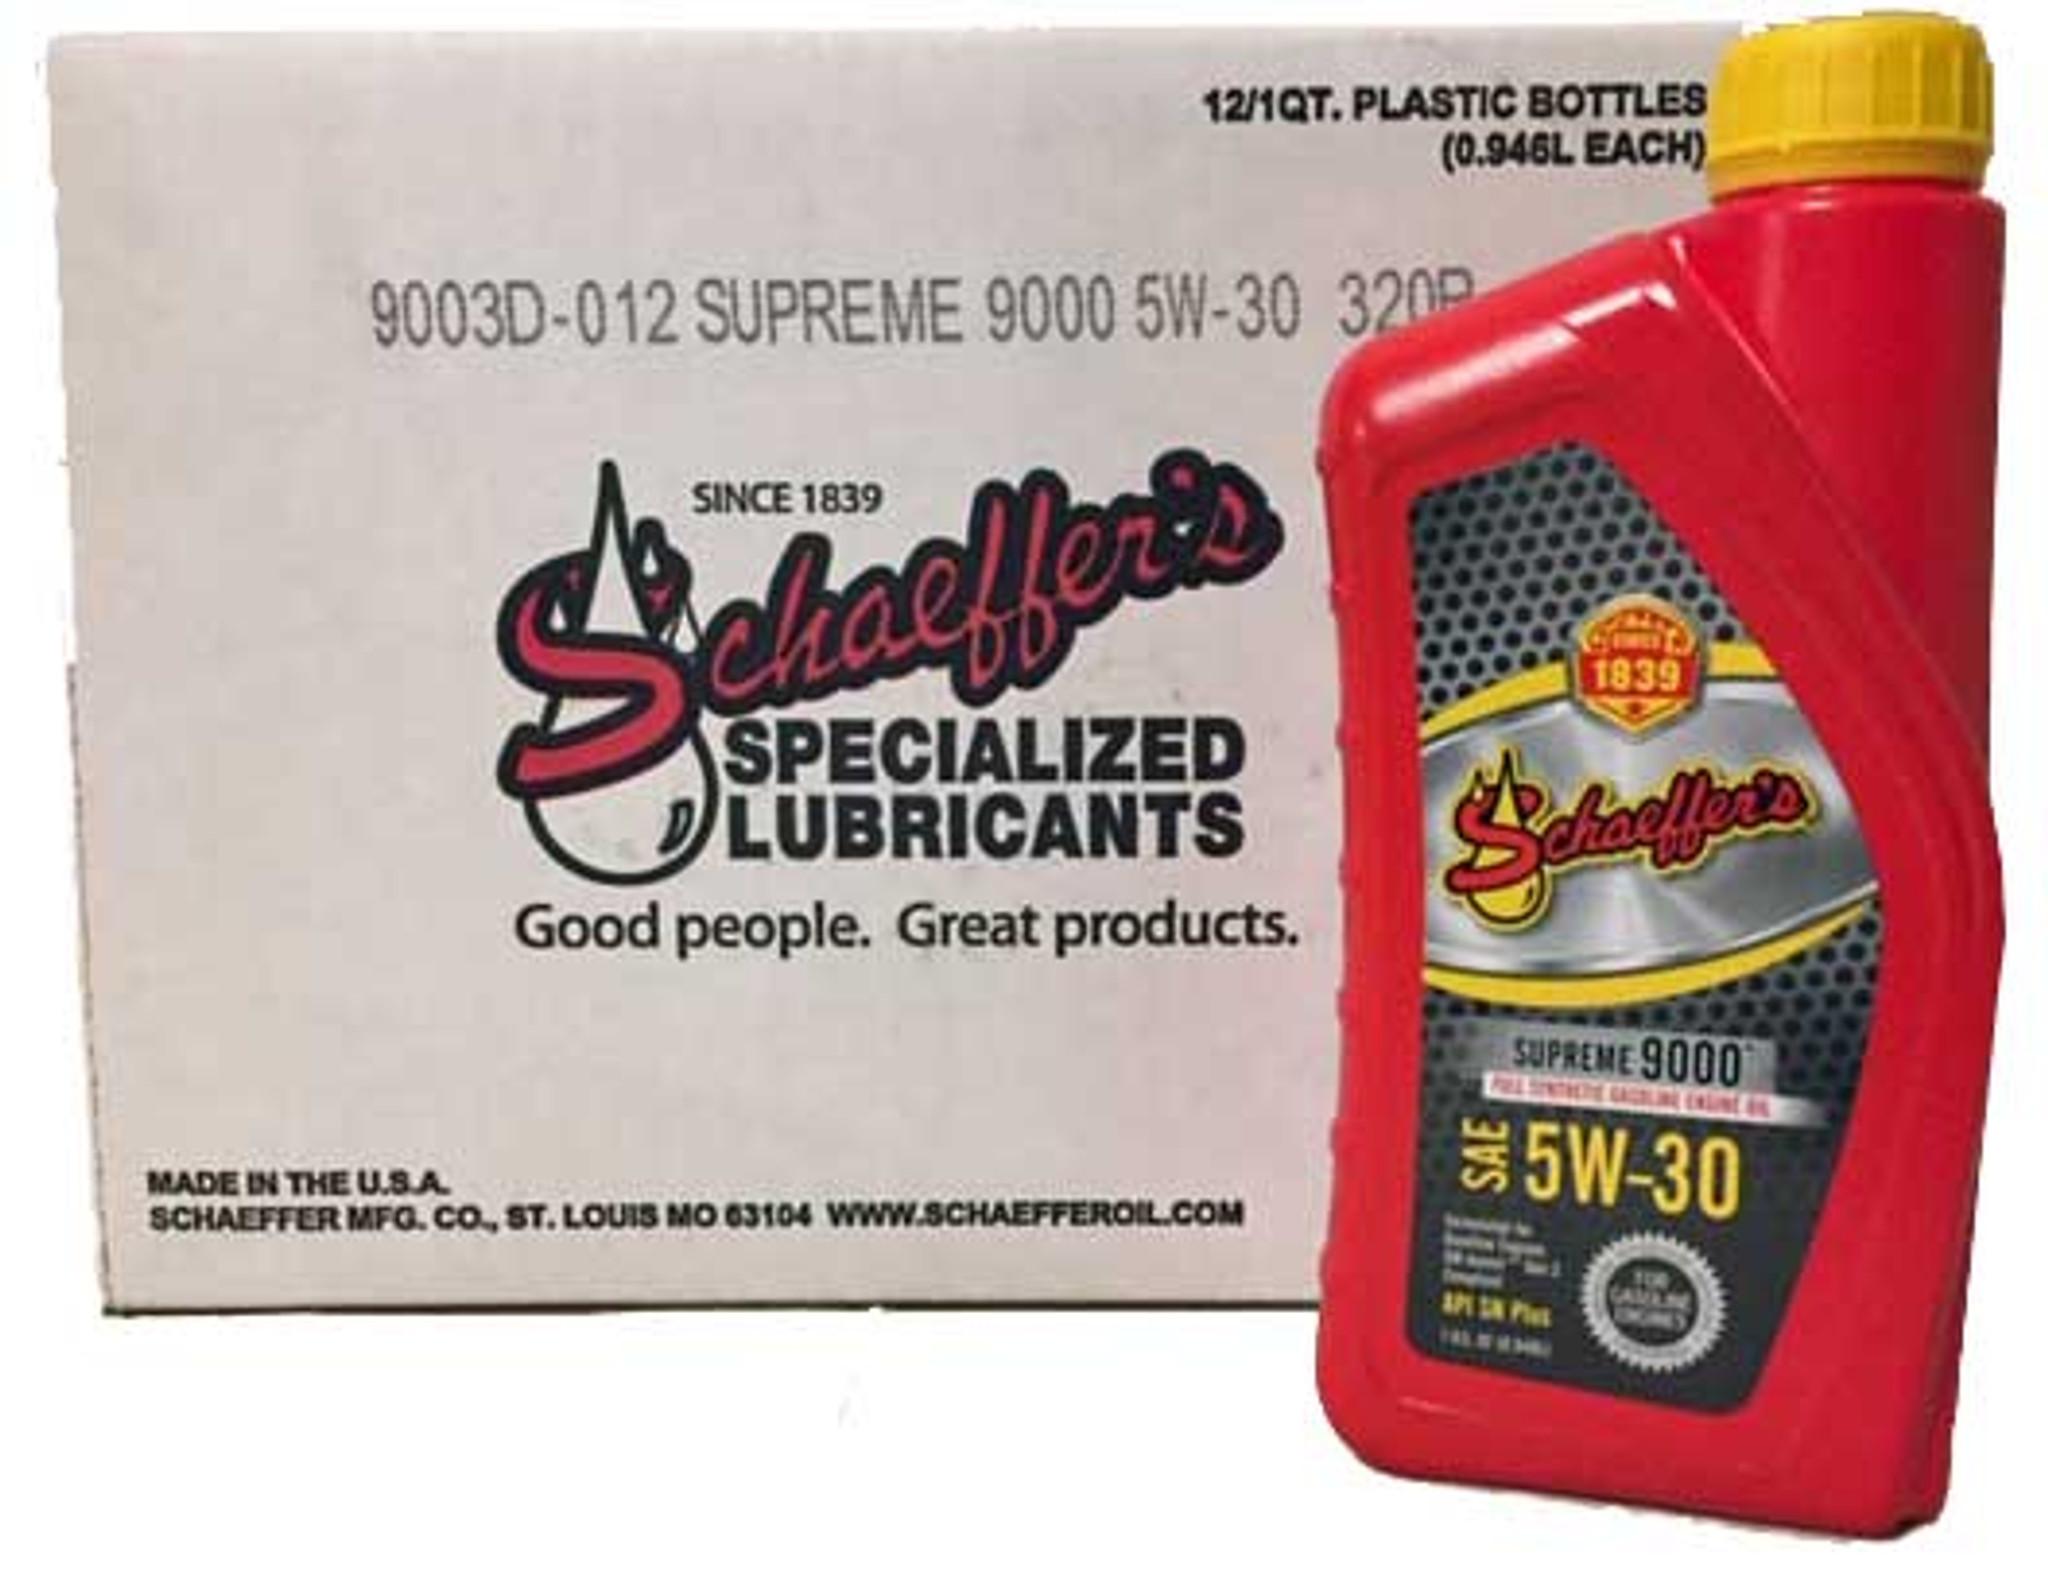 Schaeffer's 9003D SAE 5W-30 Supreme 9000 Full Synthetic